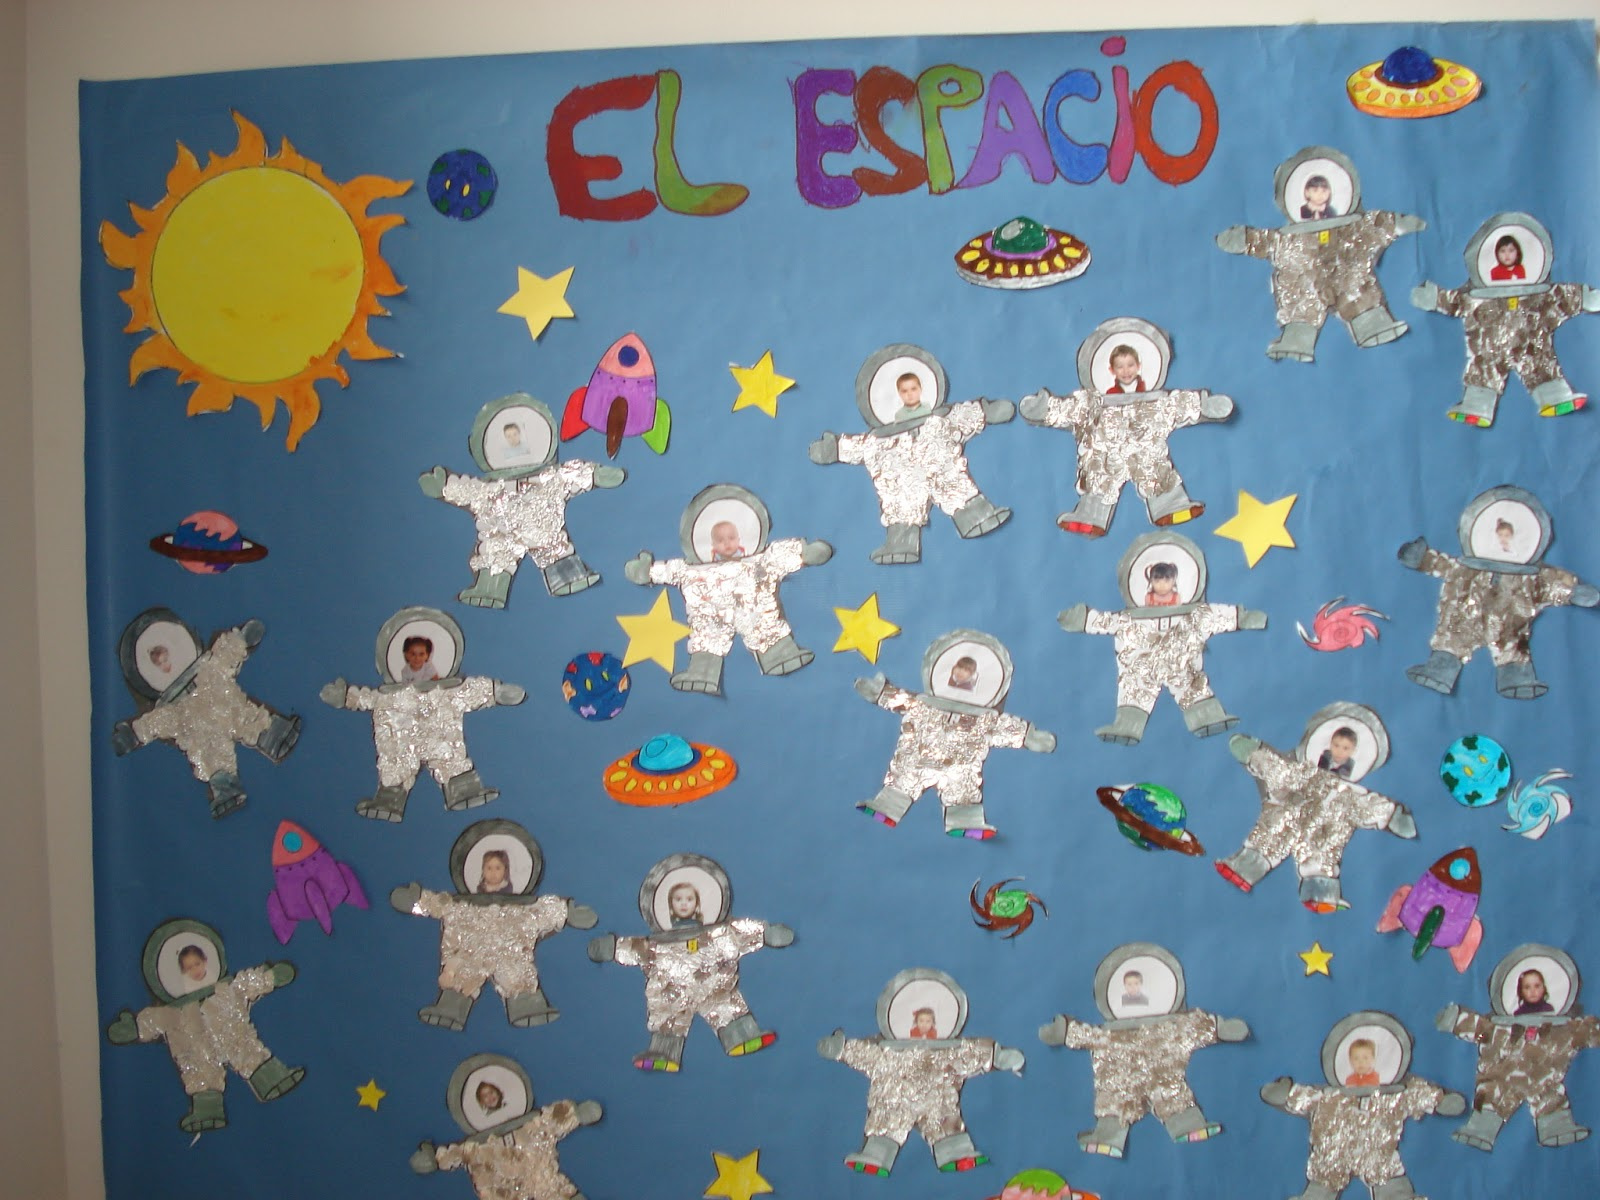 Infantil en ribadesella mayo 2013 - Mural navidad infantil ...